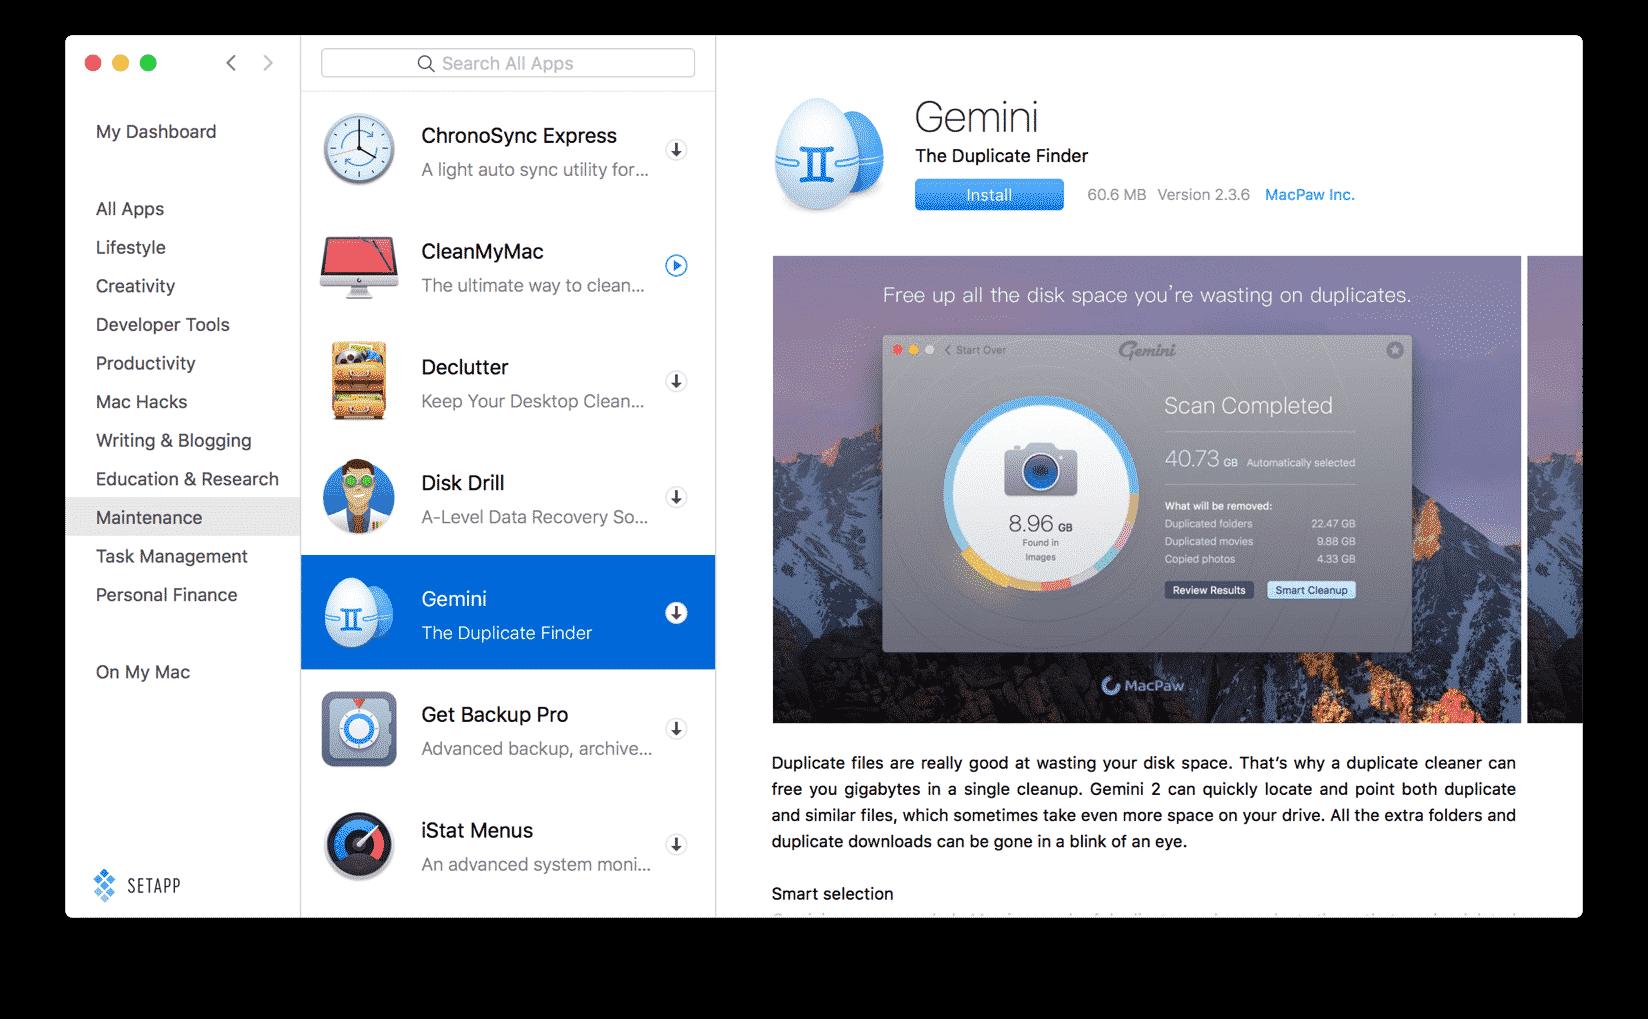 MacPaw Setapp Subscription